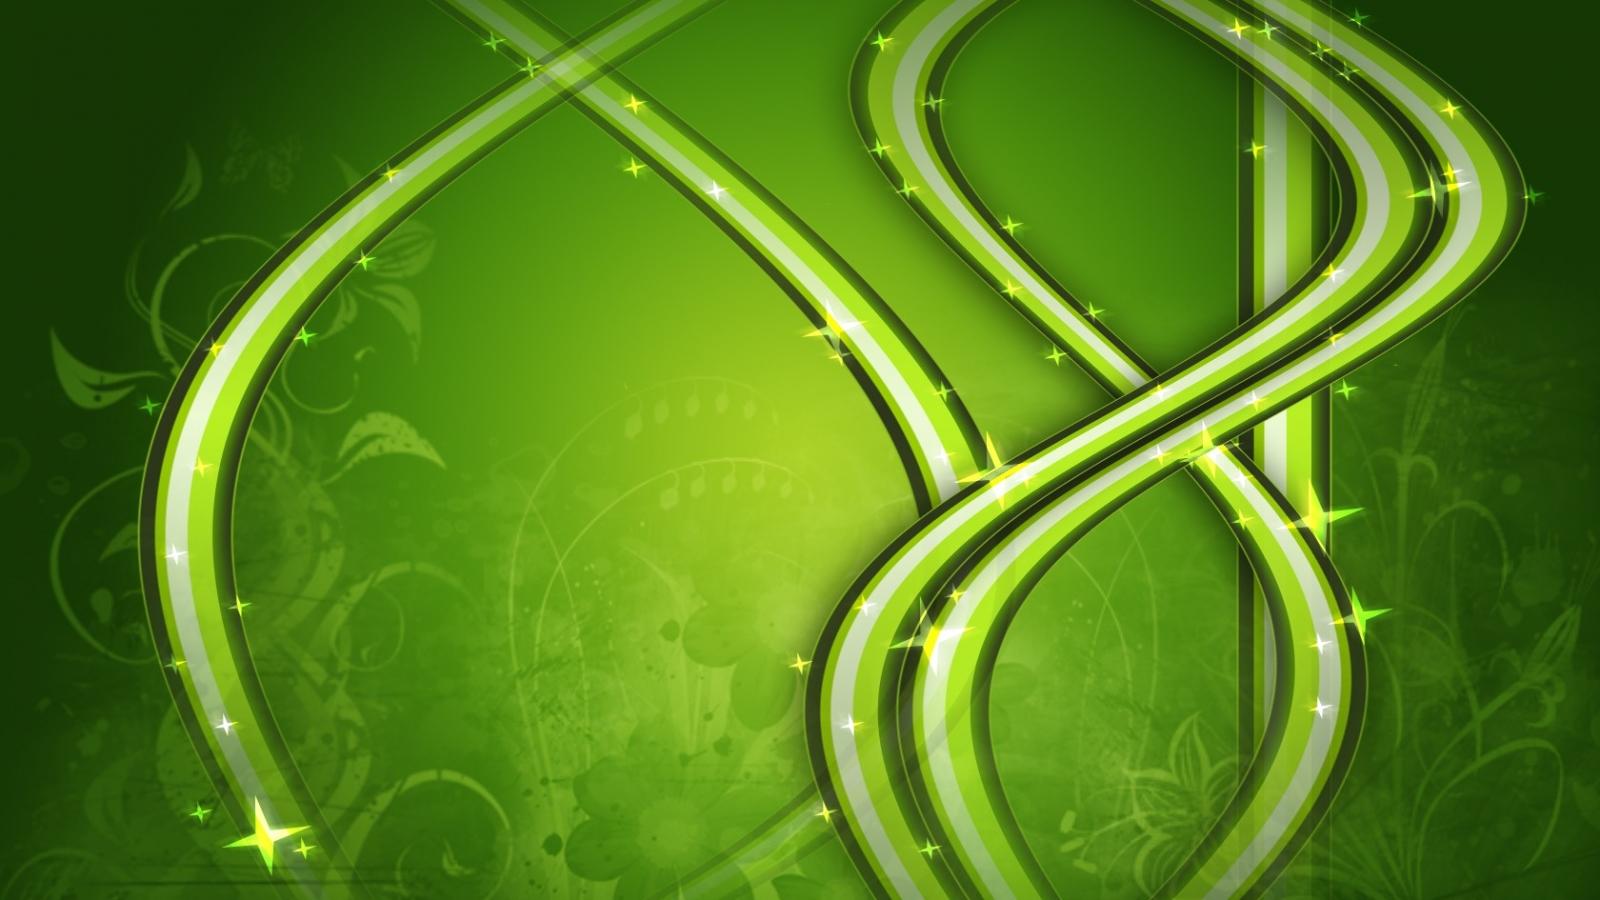 Adornos verdes - 1600x900